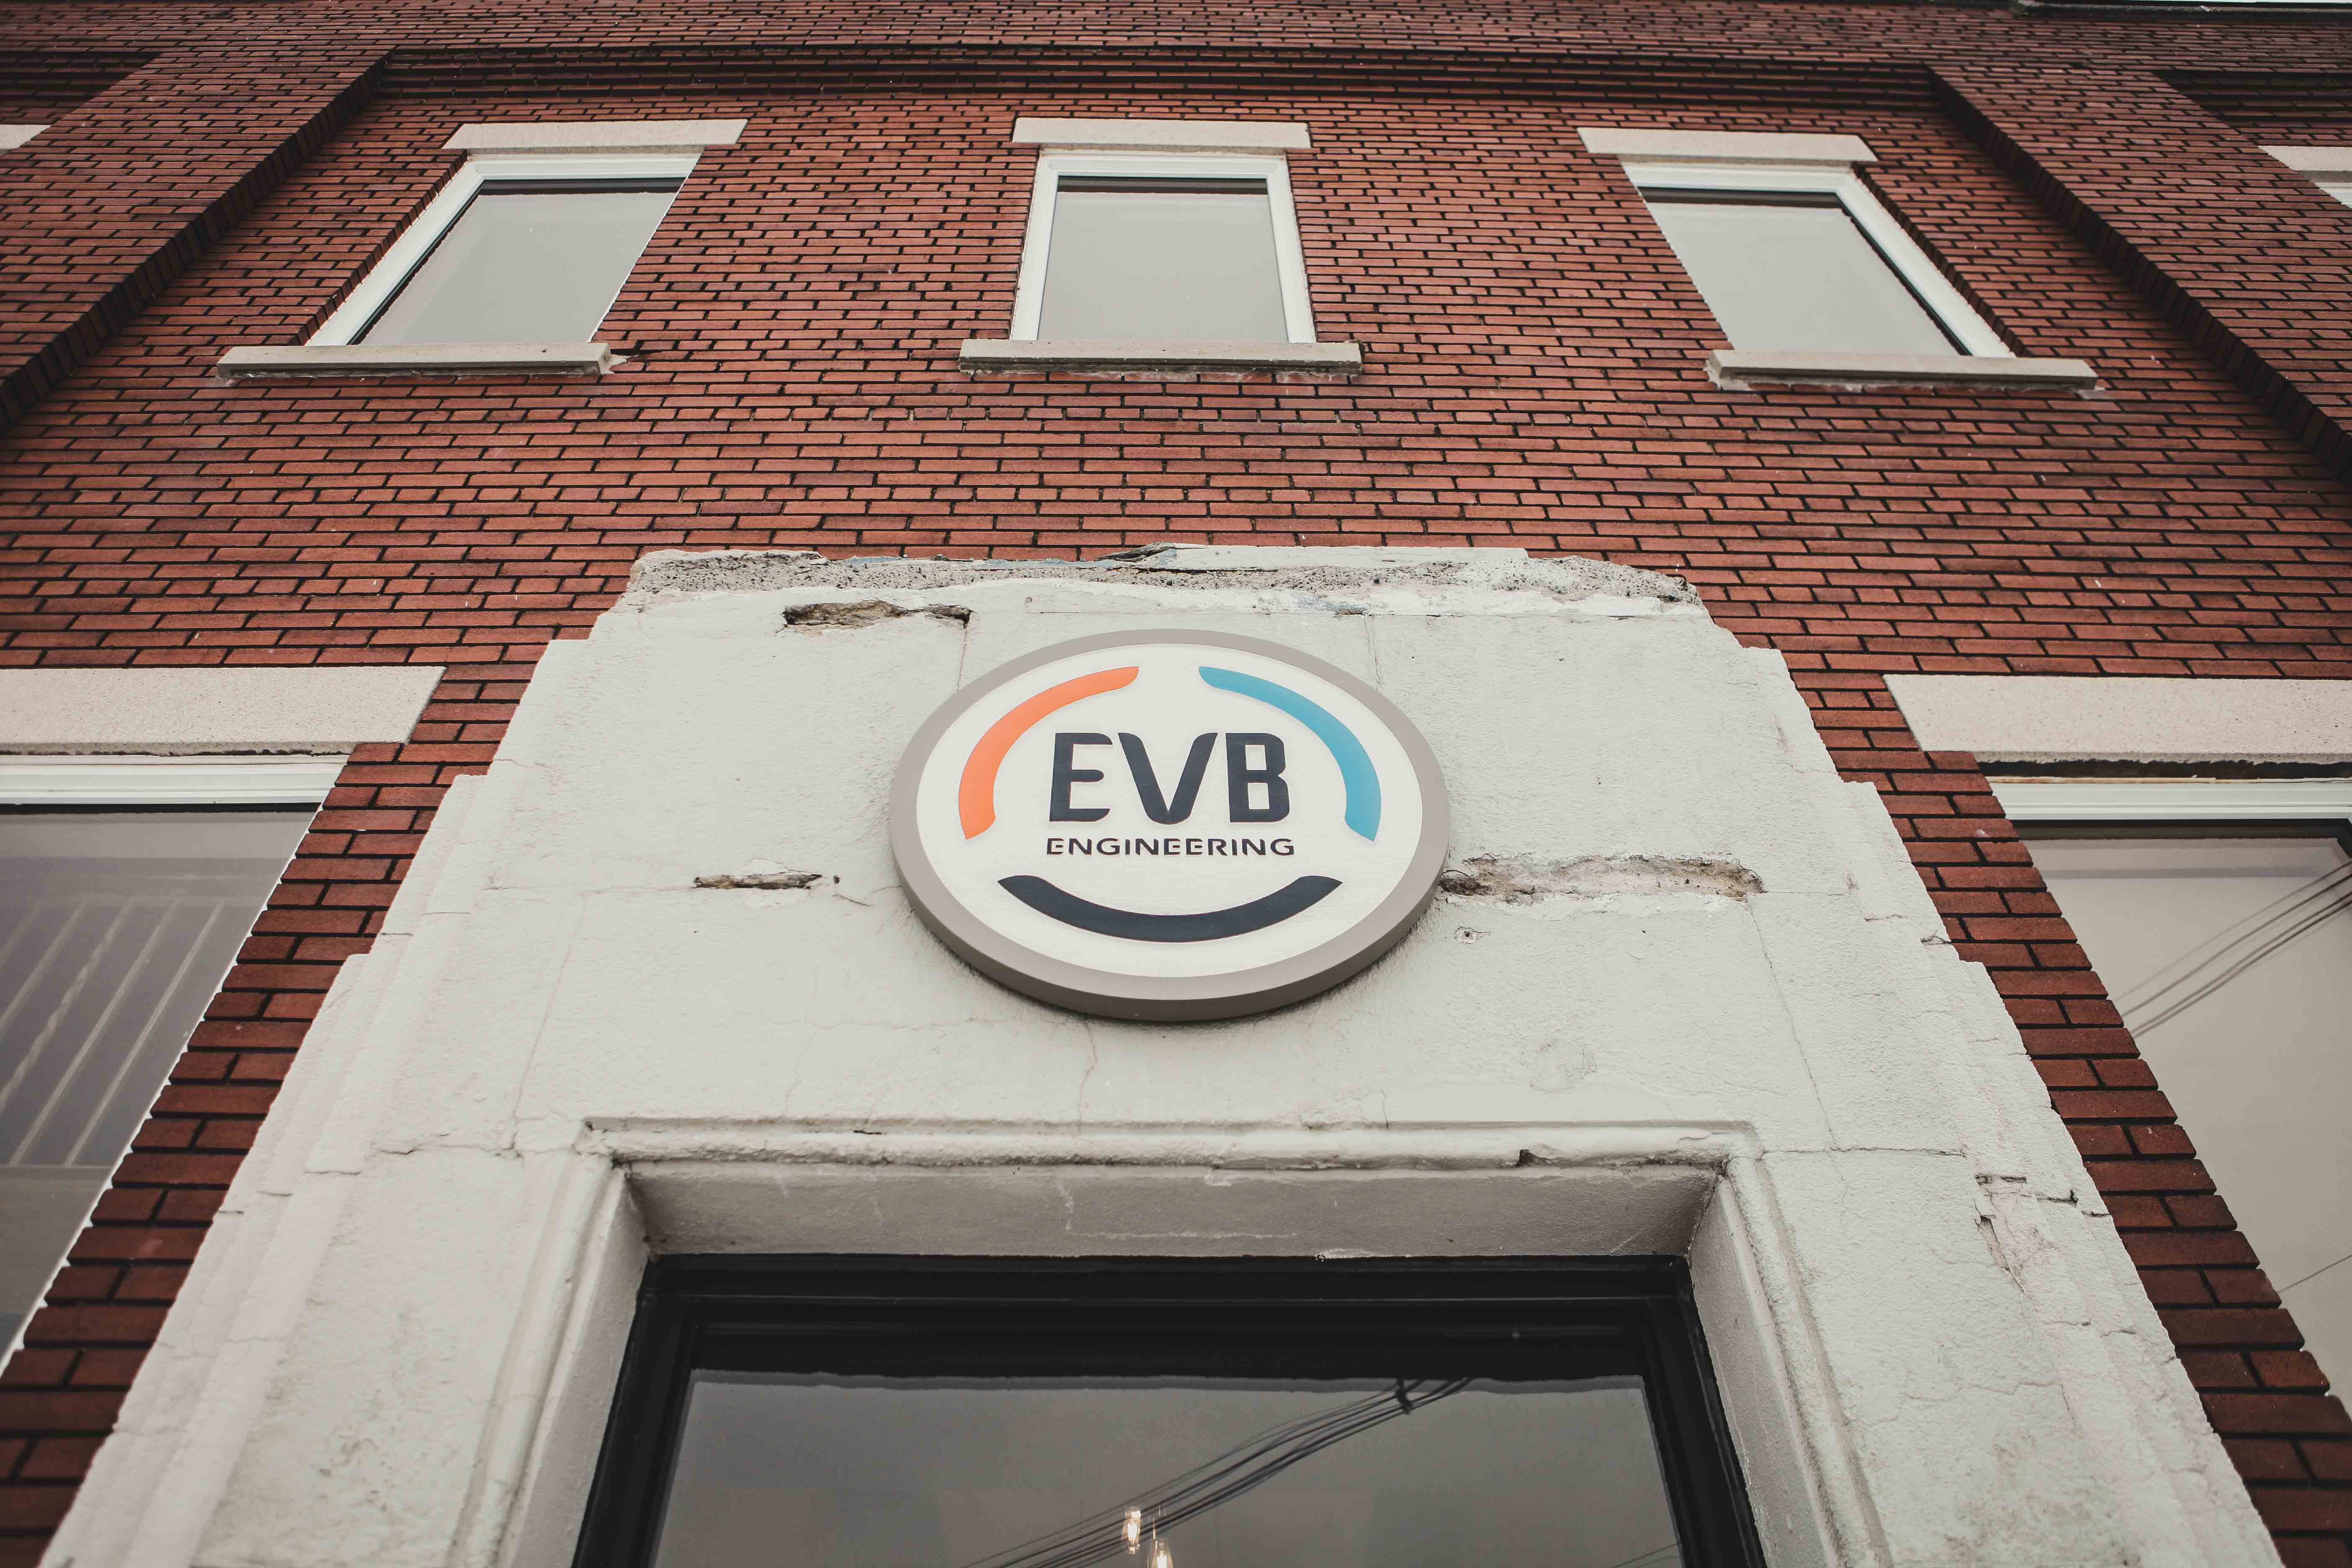 EVB Engineering Office Building